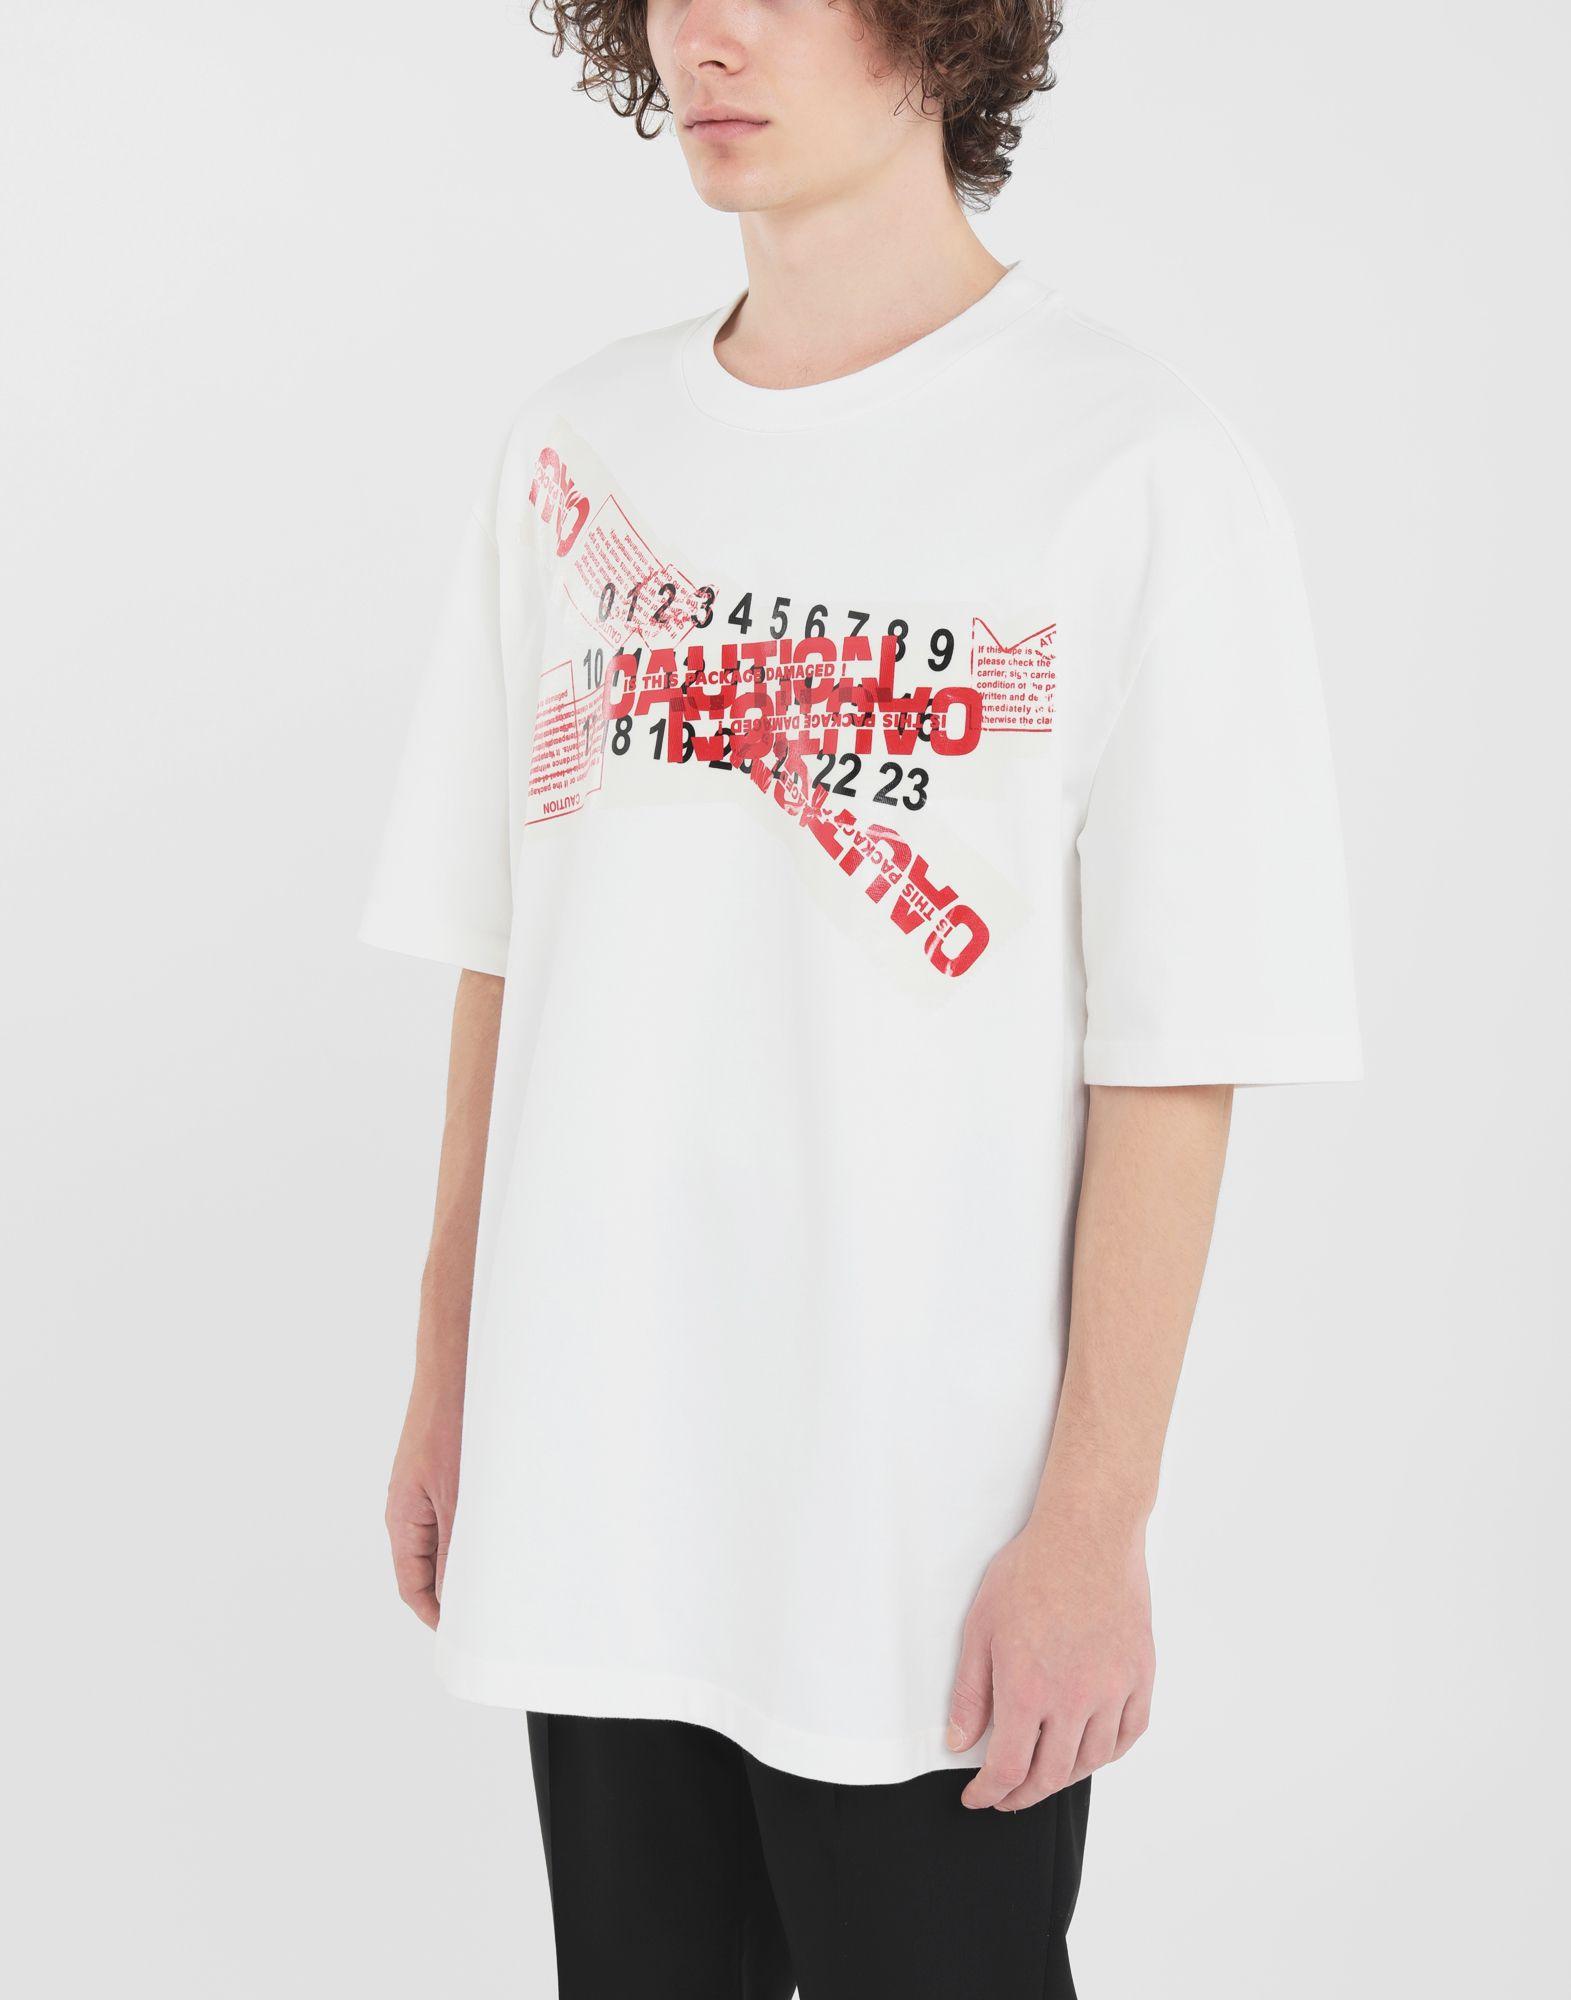 MAISON MARGIELA 'Caution' T-shirt Short sleeve t-shirt Man r